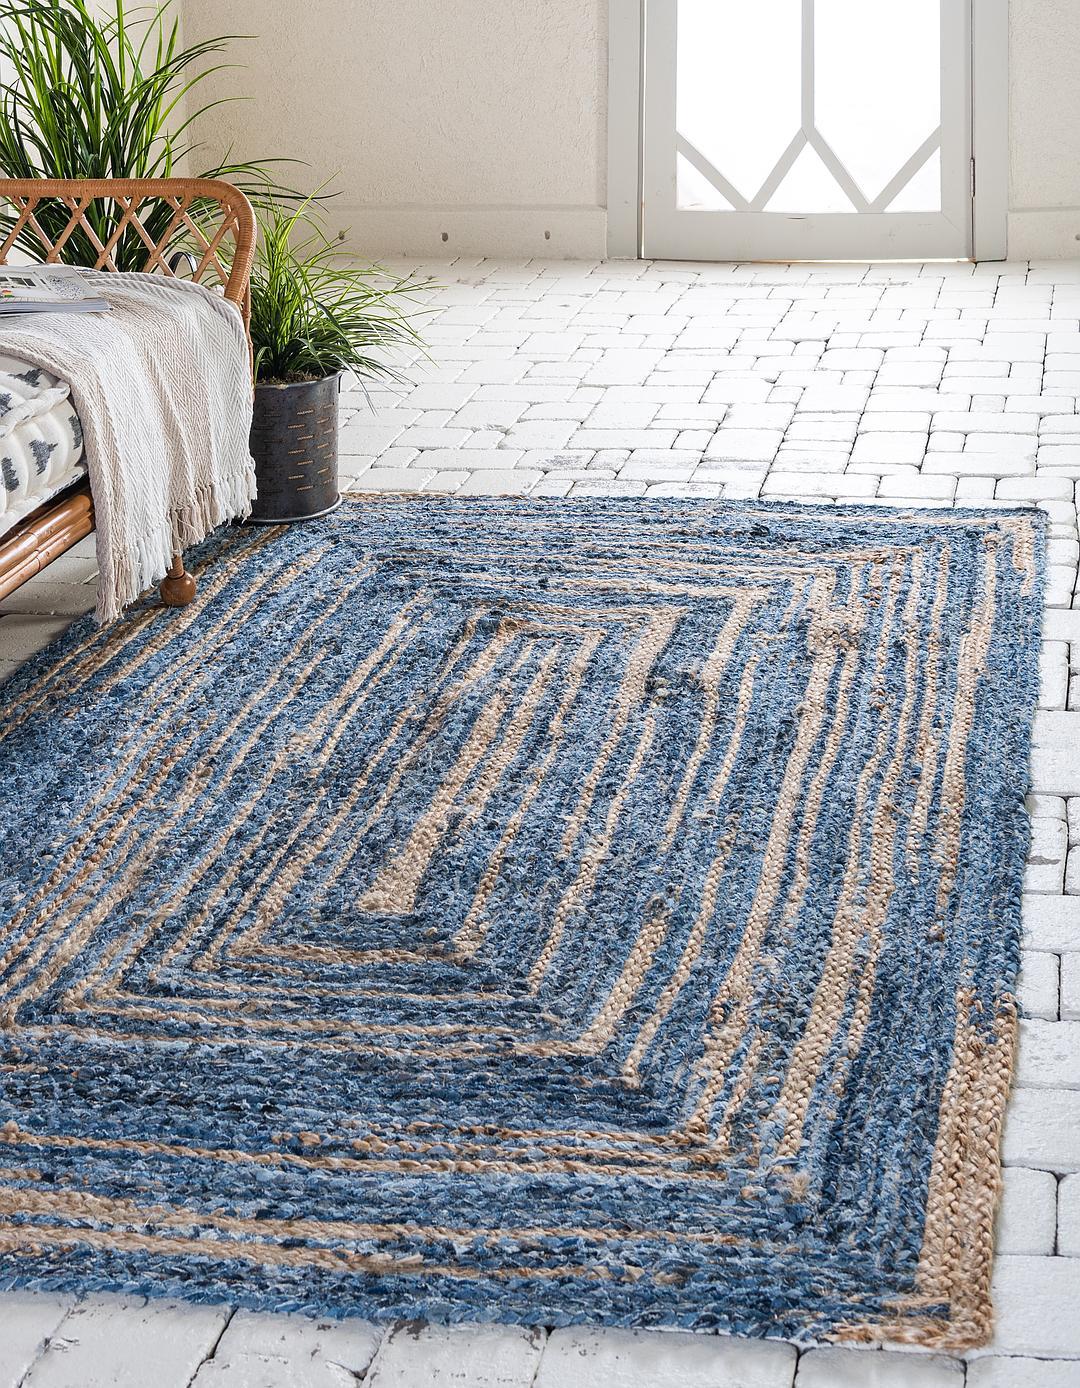 blue unique loom 9 39 x 12 39 braided chindi rug area rugs. Black Bedroom Furniture Sets. Home Design Ideas